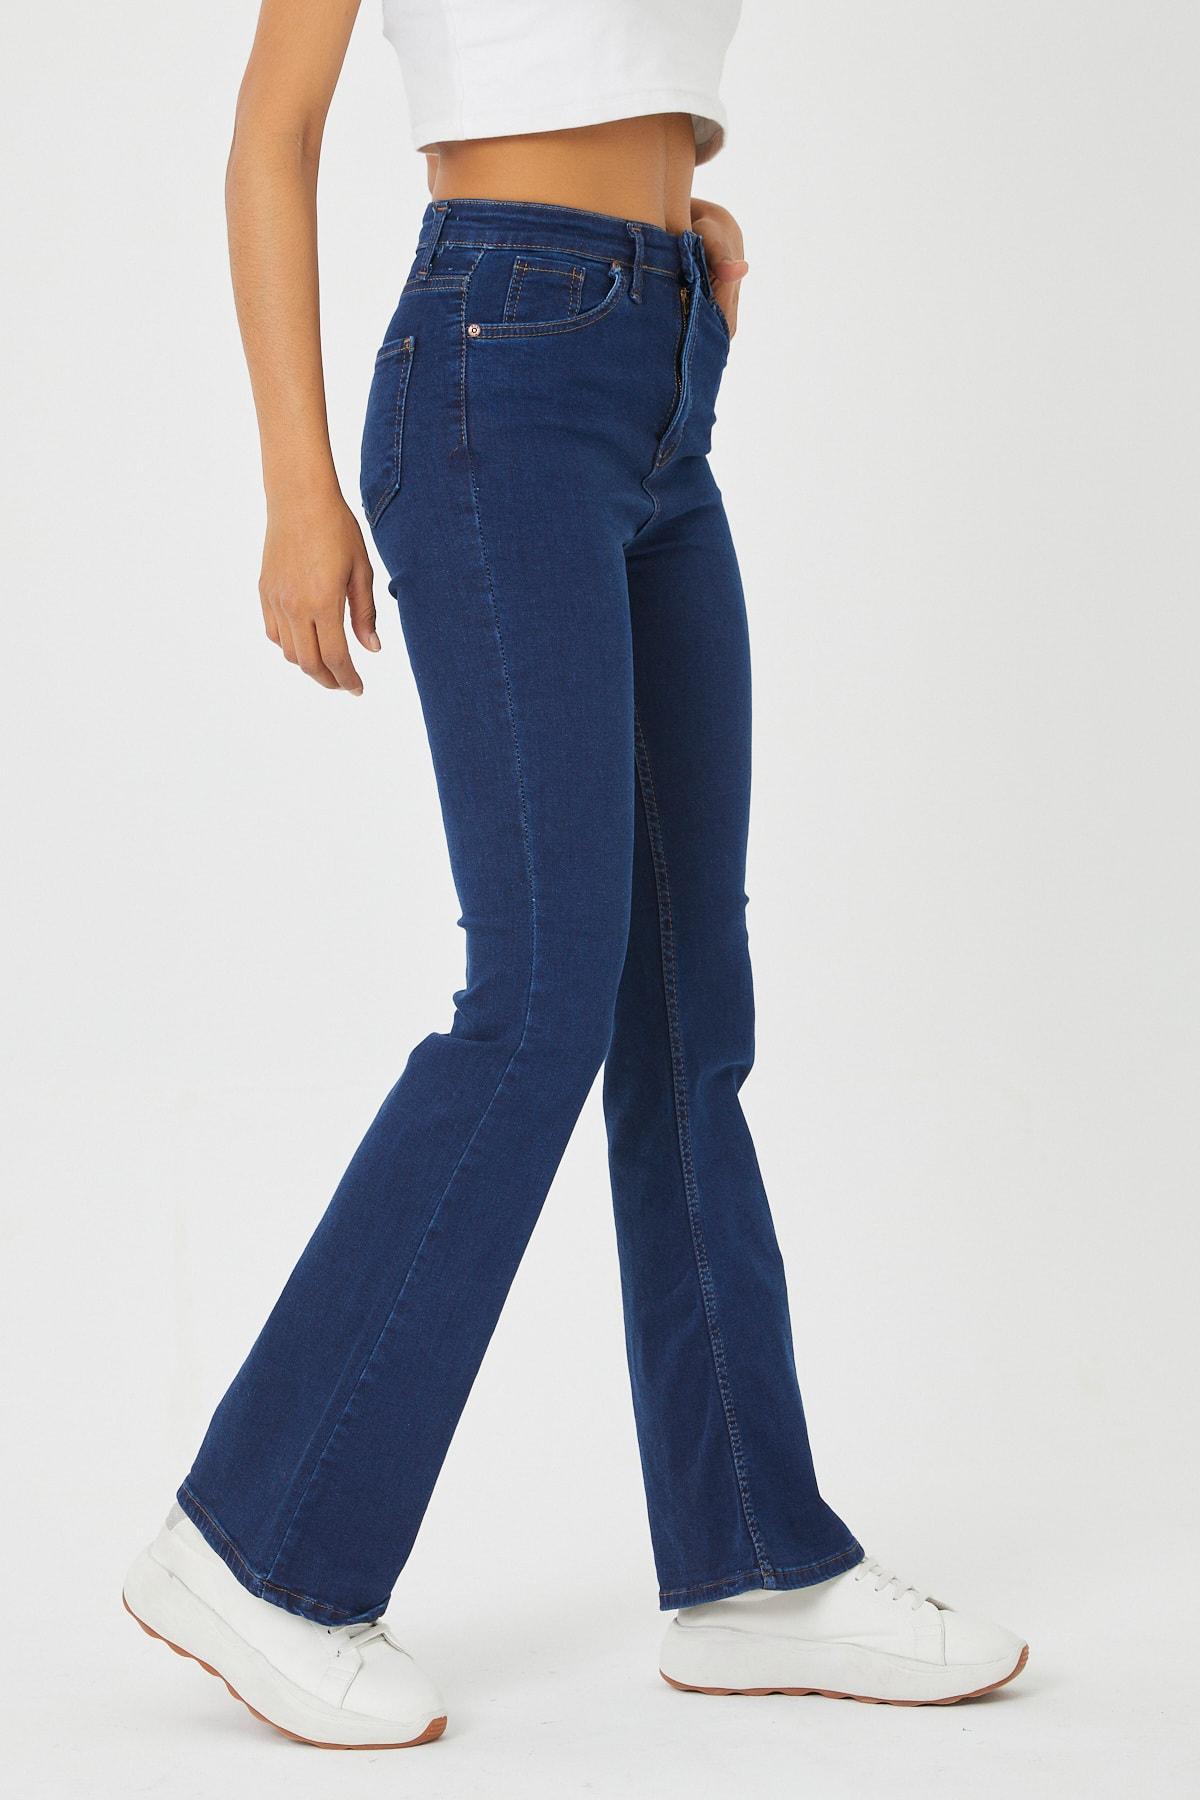 VAV Kadın Mavi İspanyol Paça Kot Pantolon 1